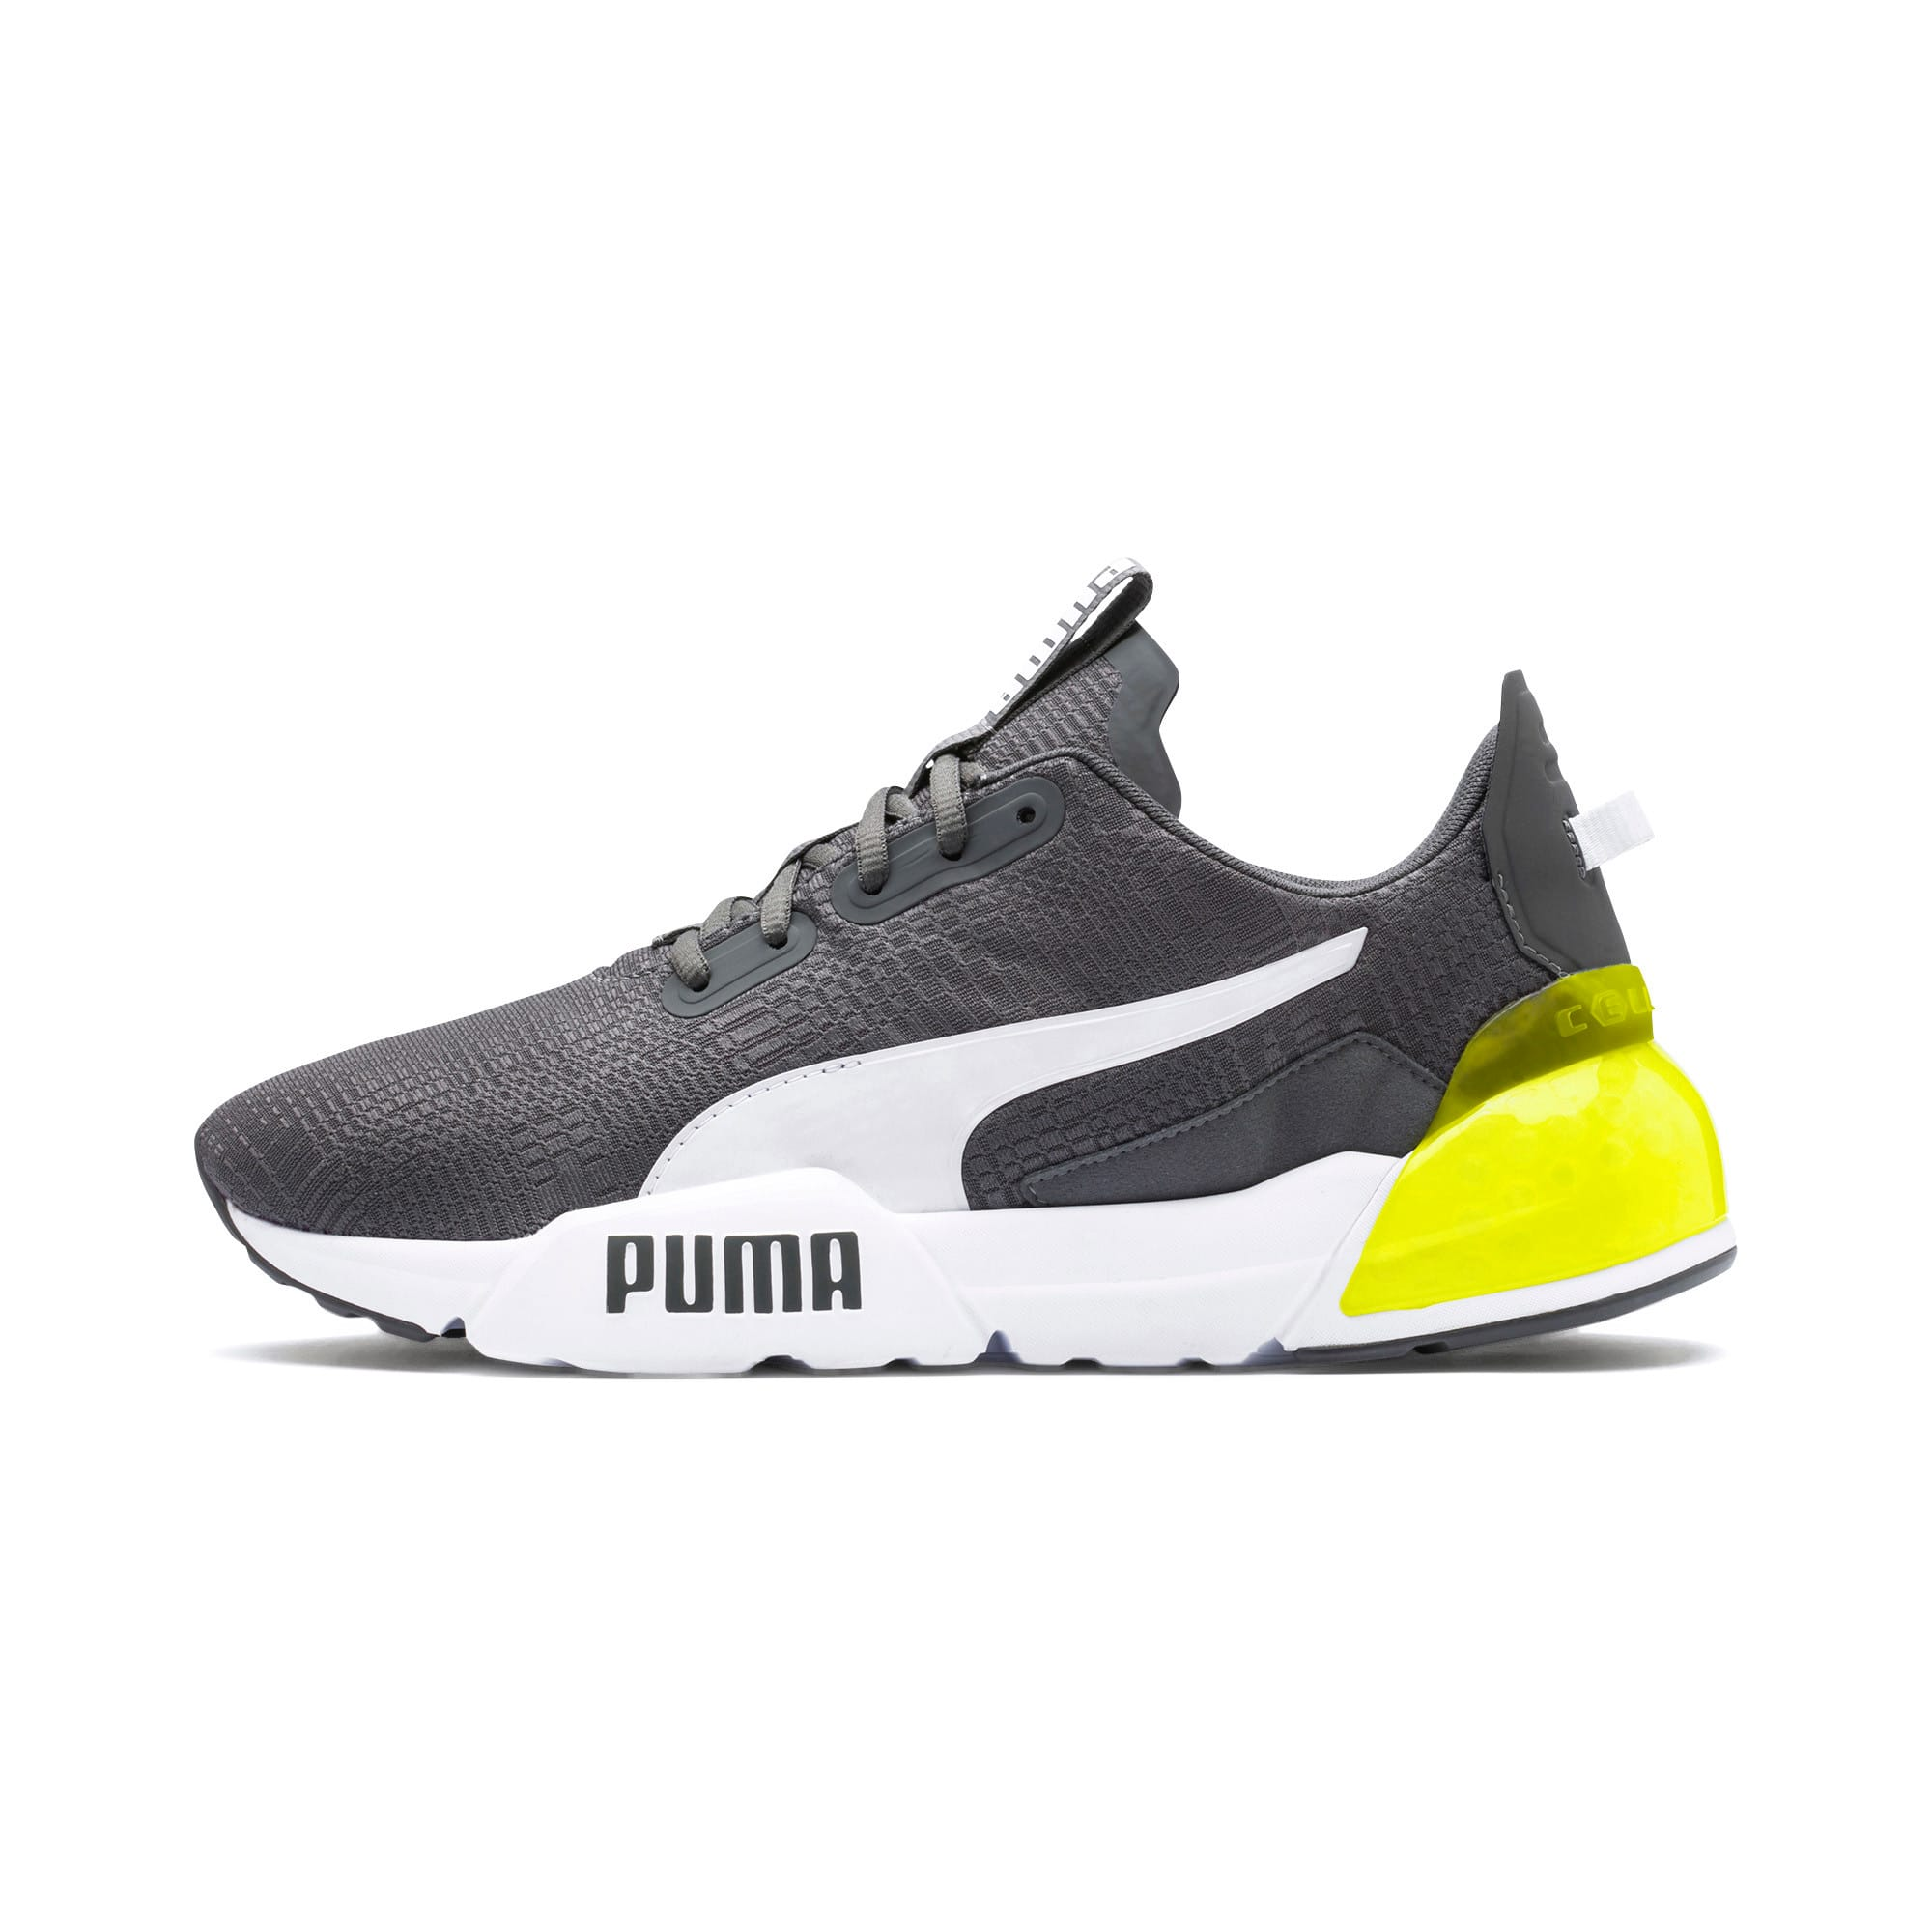 Thumbnail 1 of CELL Phase Lights Men's Training Shoes, CASTLEROCK-Yellow Alert, medium